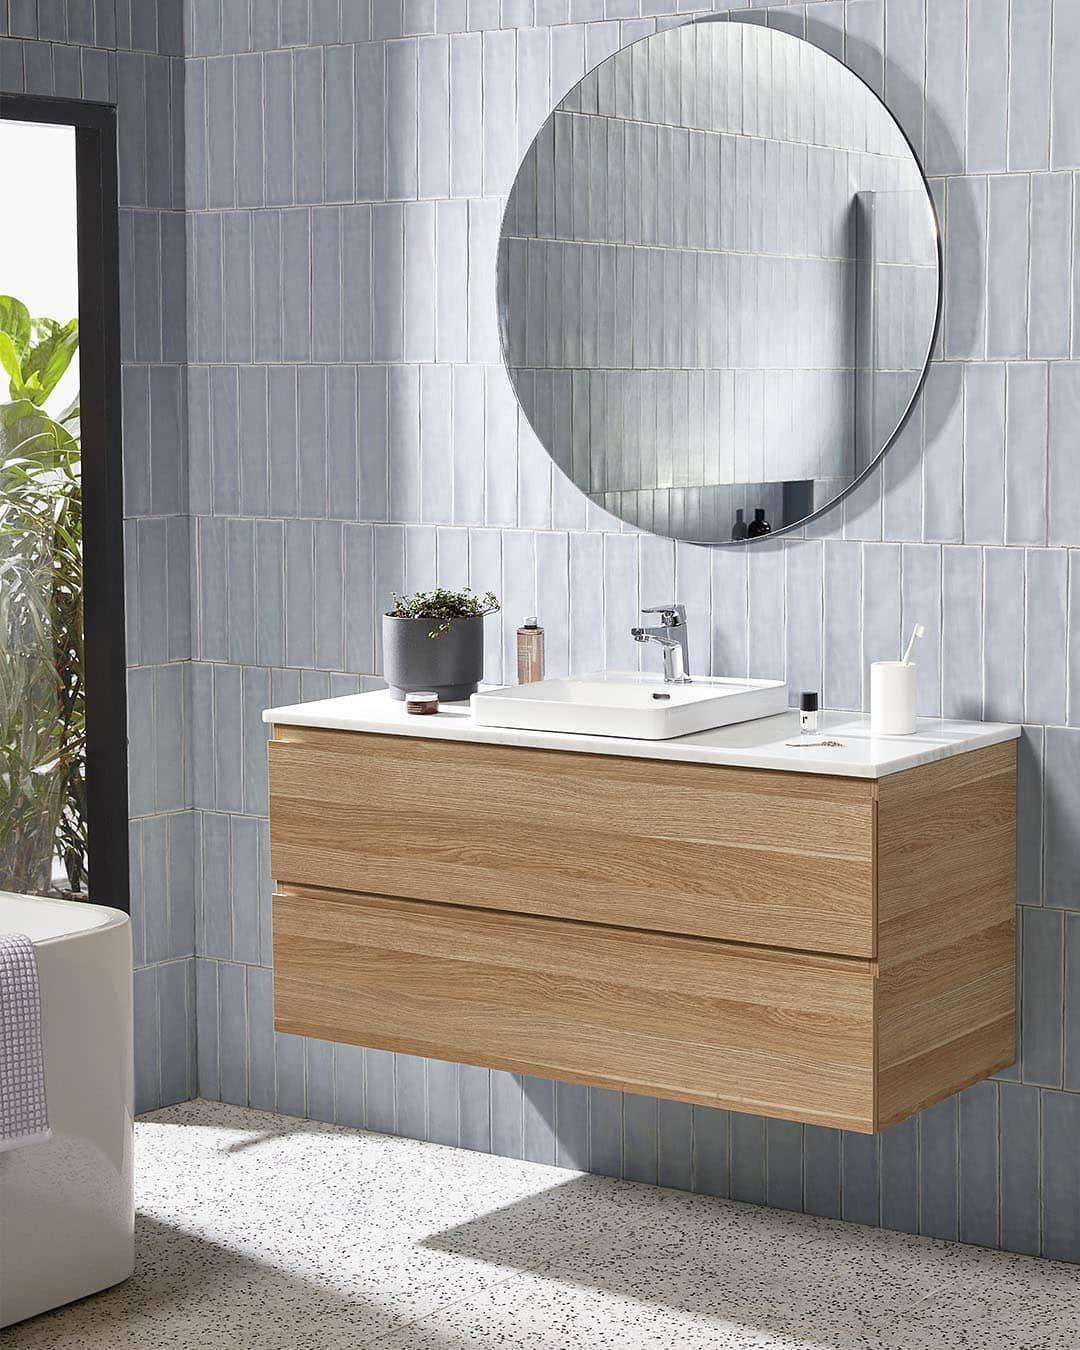 Reece Bathrooms On Instagram What S Your Dream Vanity With Posh